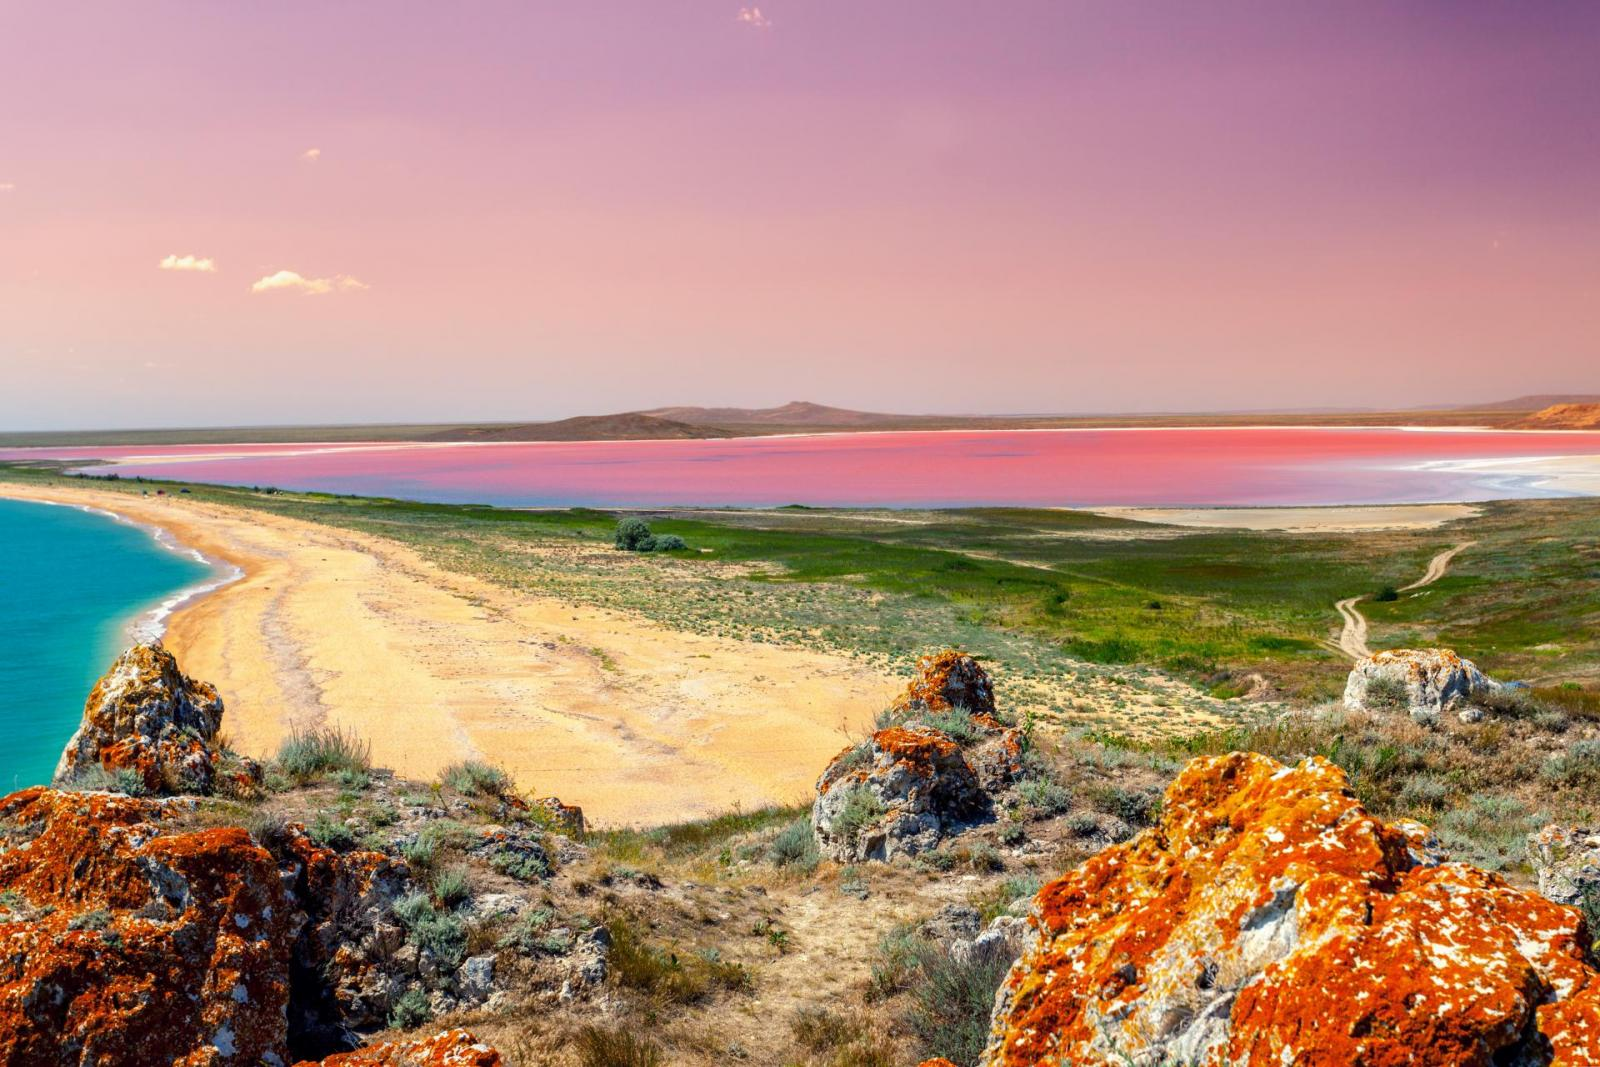 interessante Orte Australien